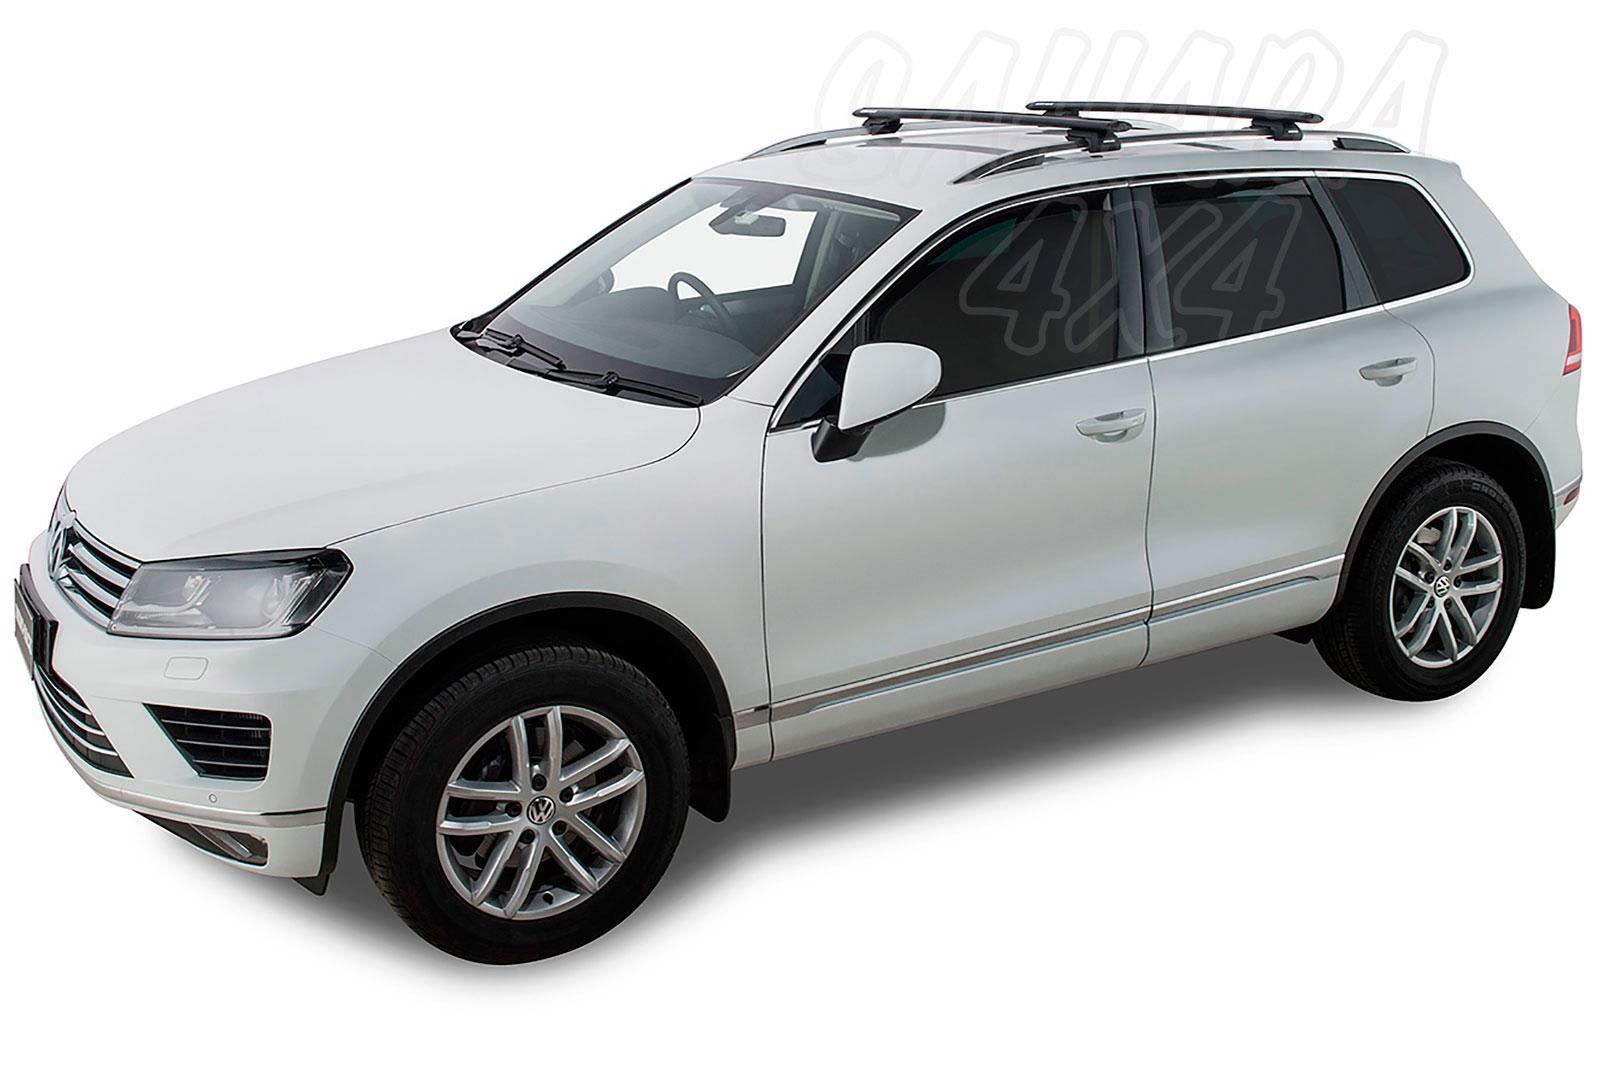 Rhino Rack Roof Bars Vortex Sx For Volkswagen Touareg 2011 2017 Fuse Box Railing Bar Kit Max Load 80kg